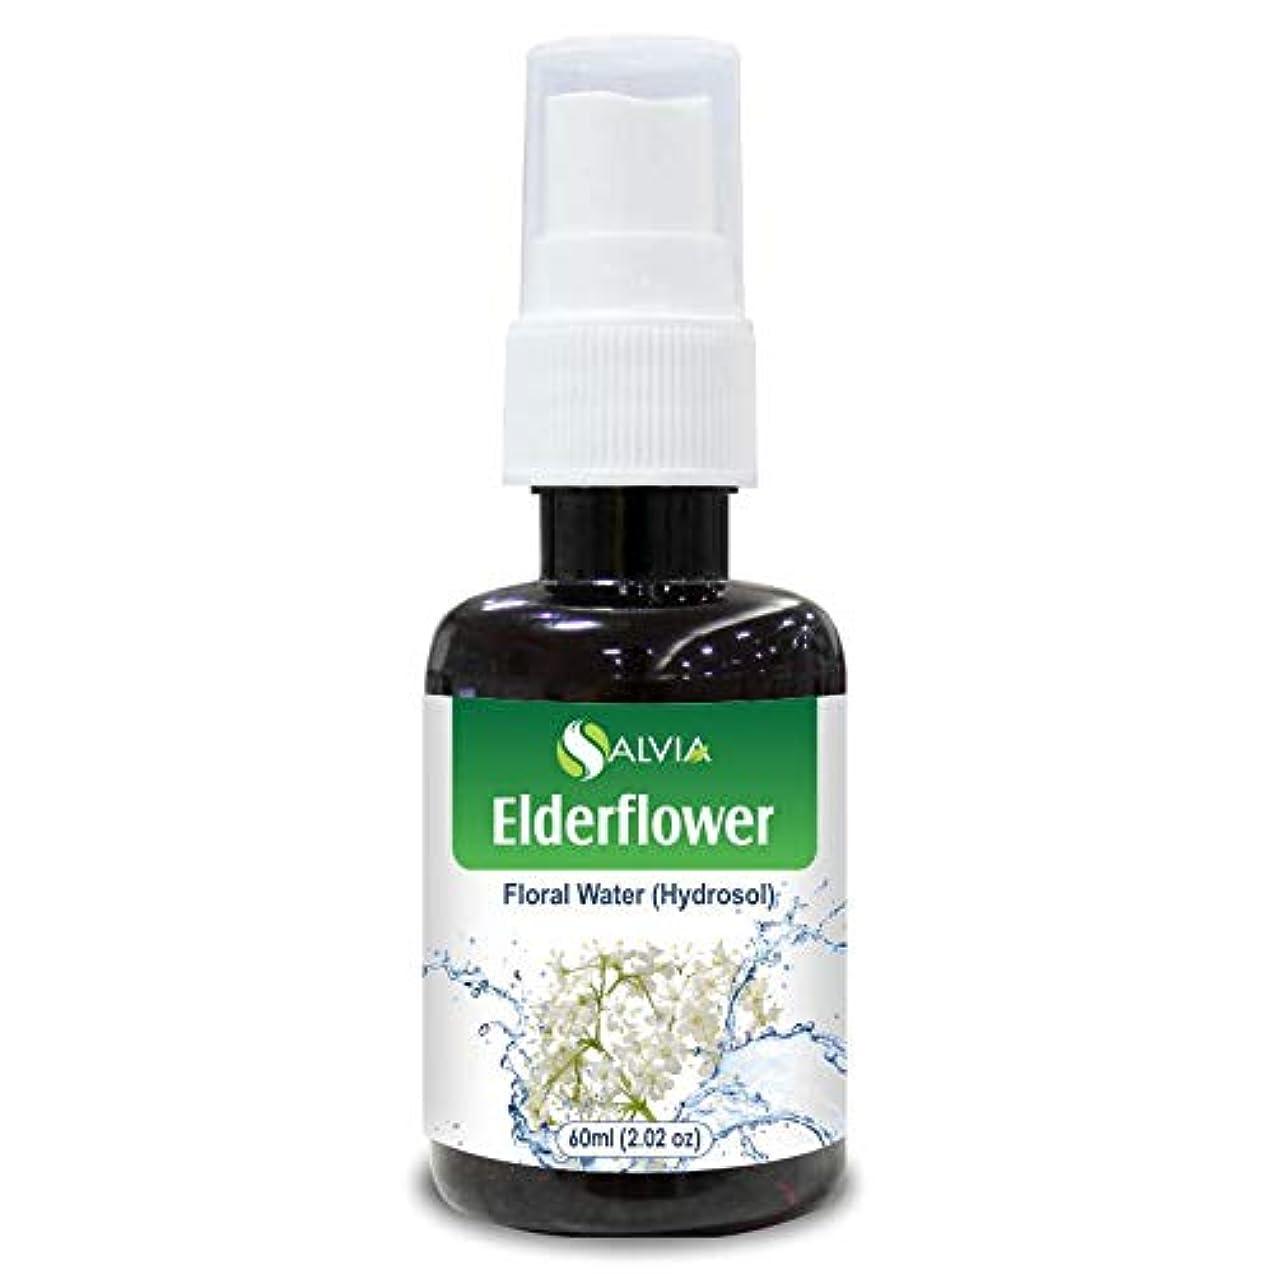 Elderflower Floral Water 60ml (Hydrosol) 100% Pure And Natural